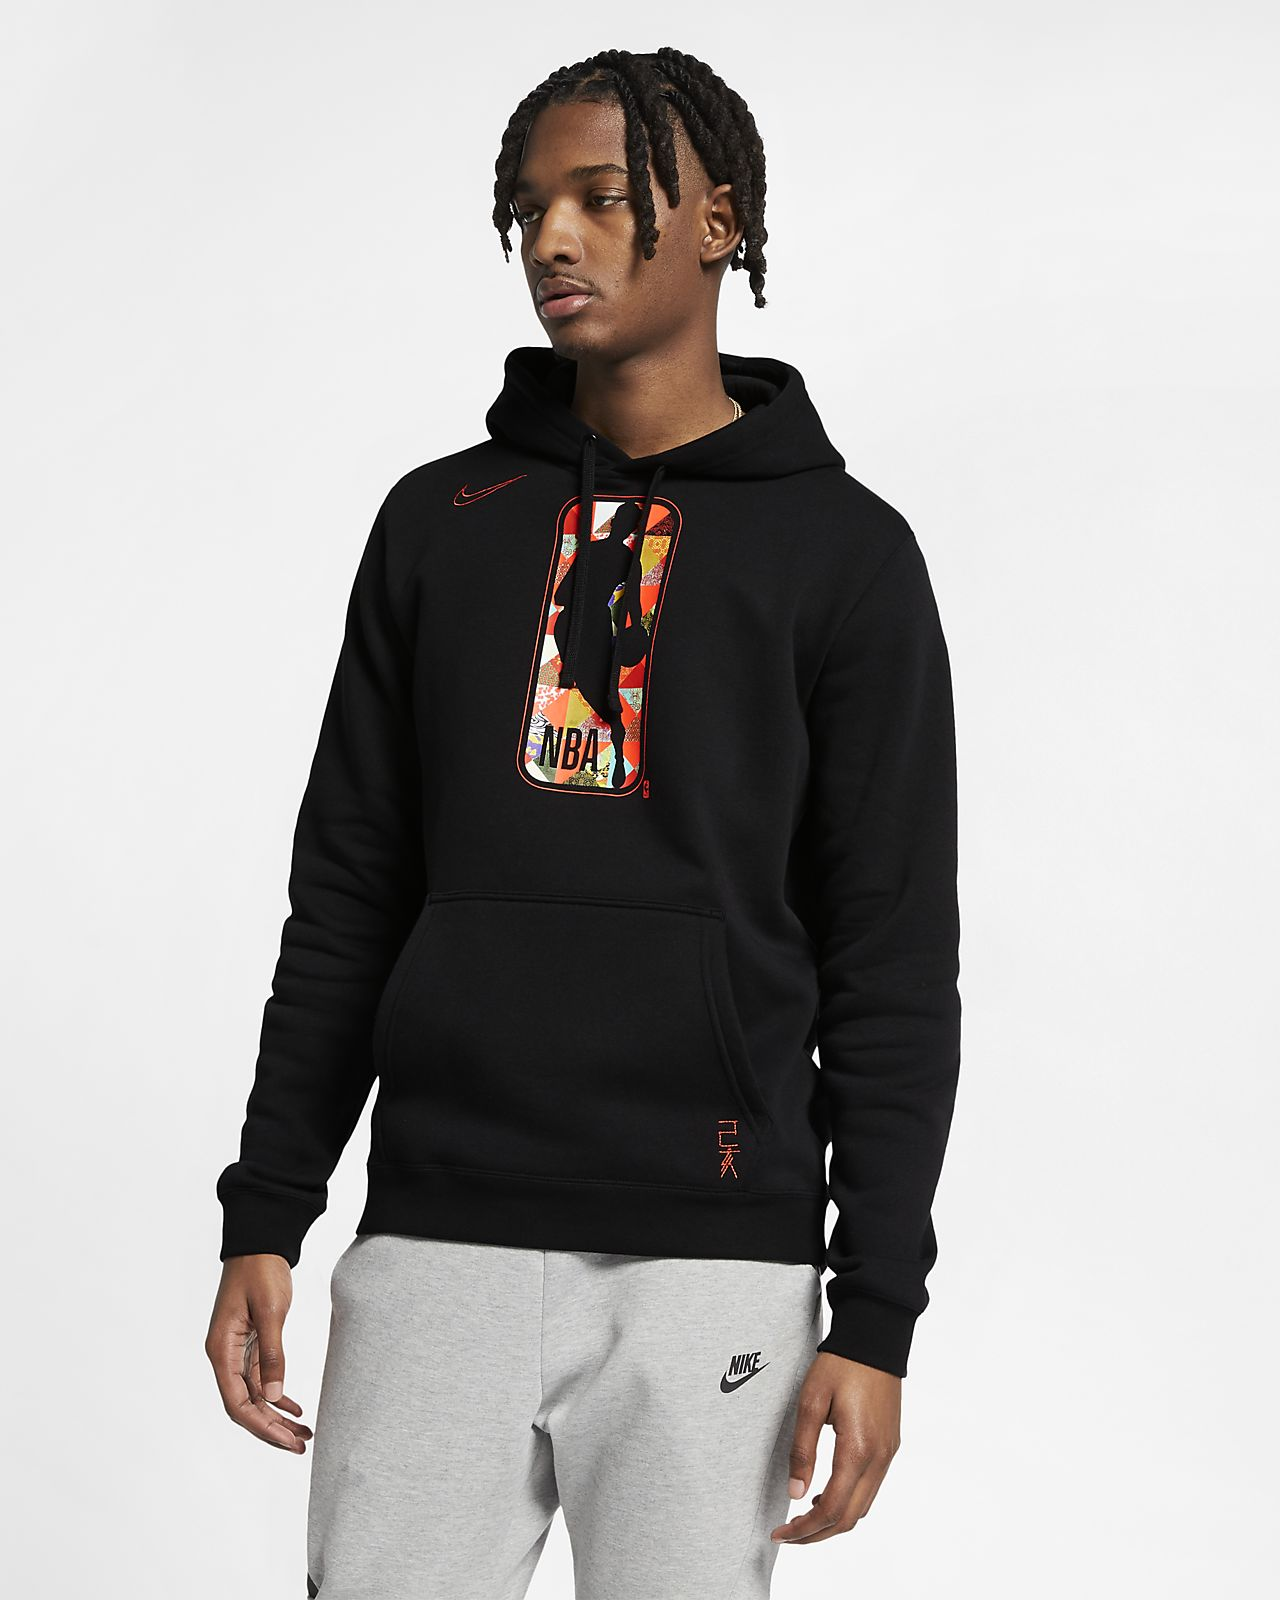 Męska bluza z kapturem NBA Nike CNY